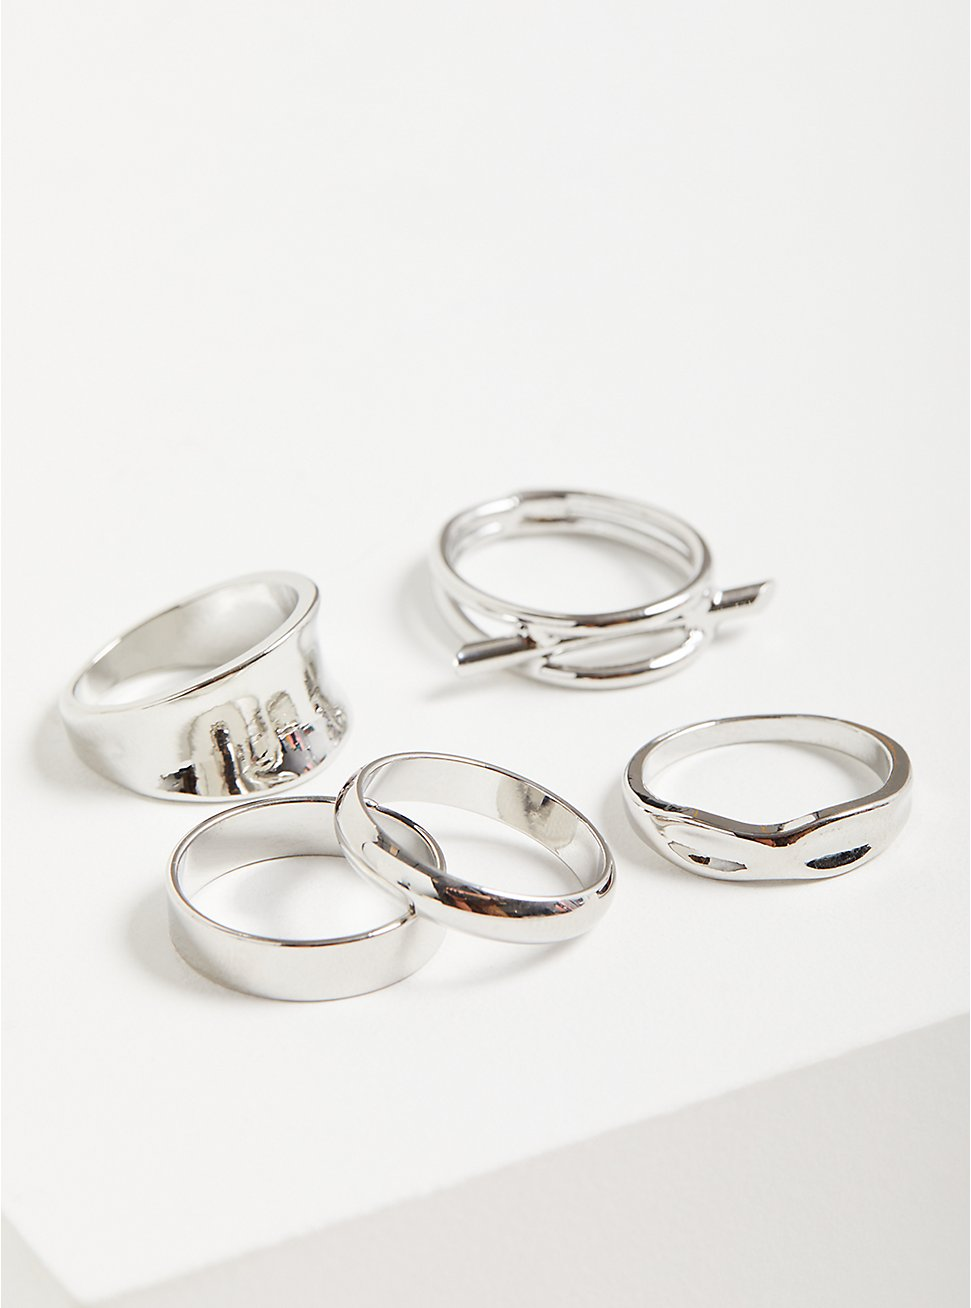 Classic Bar Ring Set of 5 - Silver Tone, SILVER, hi-res